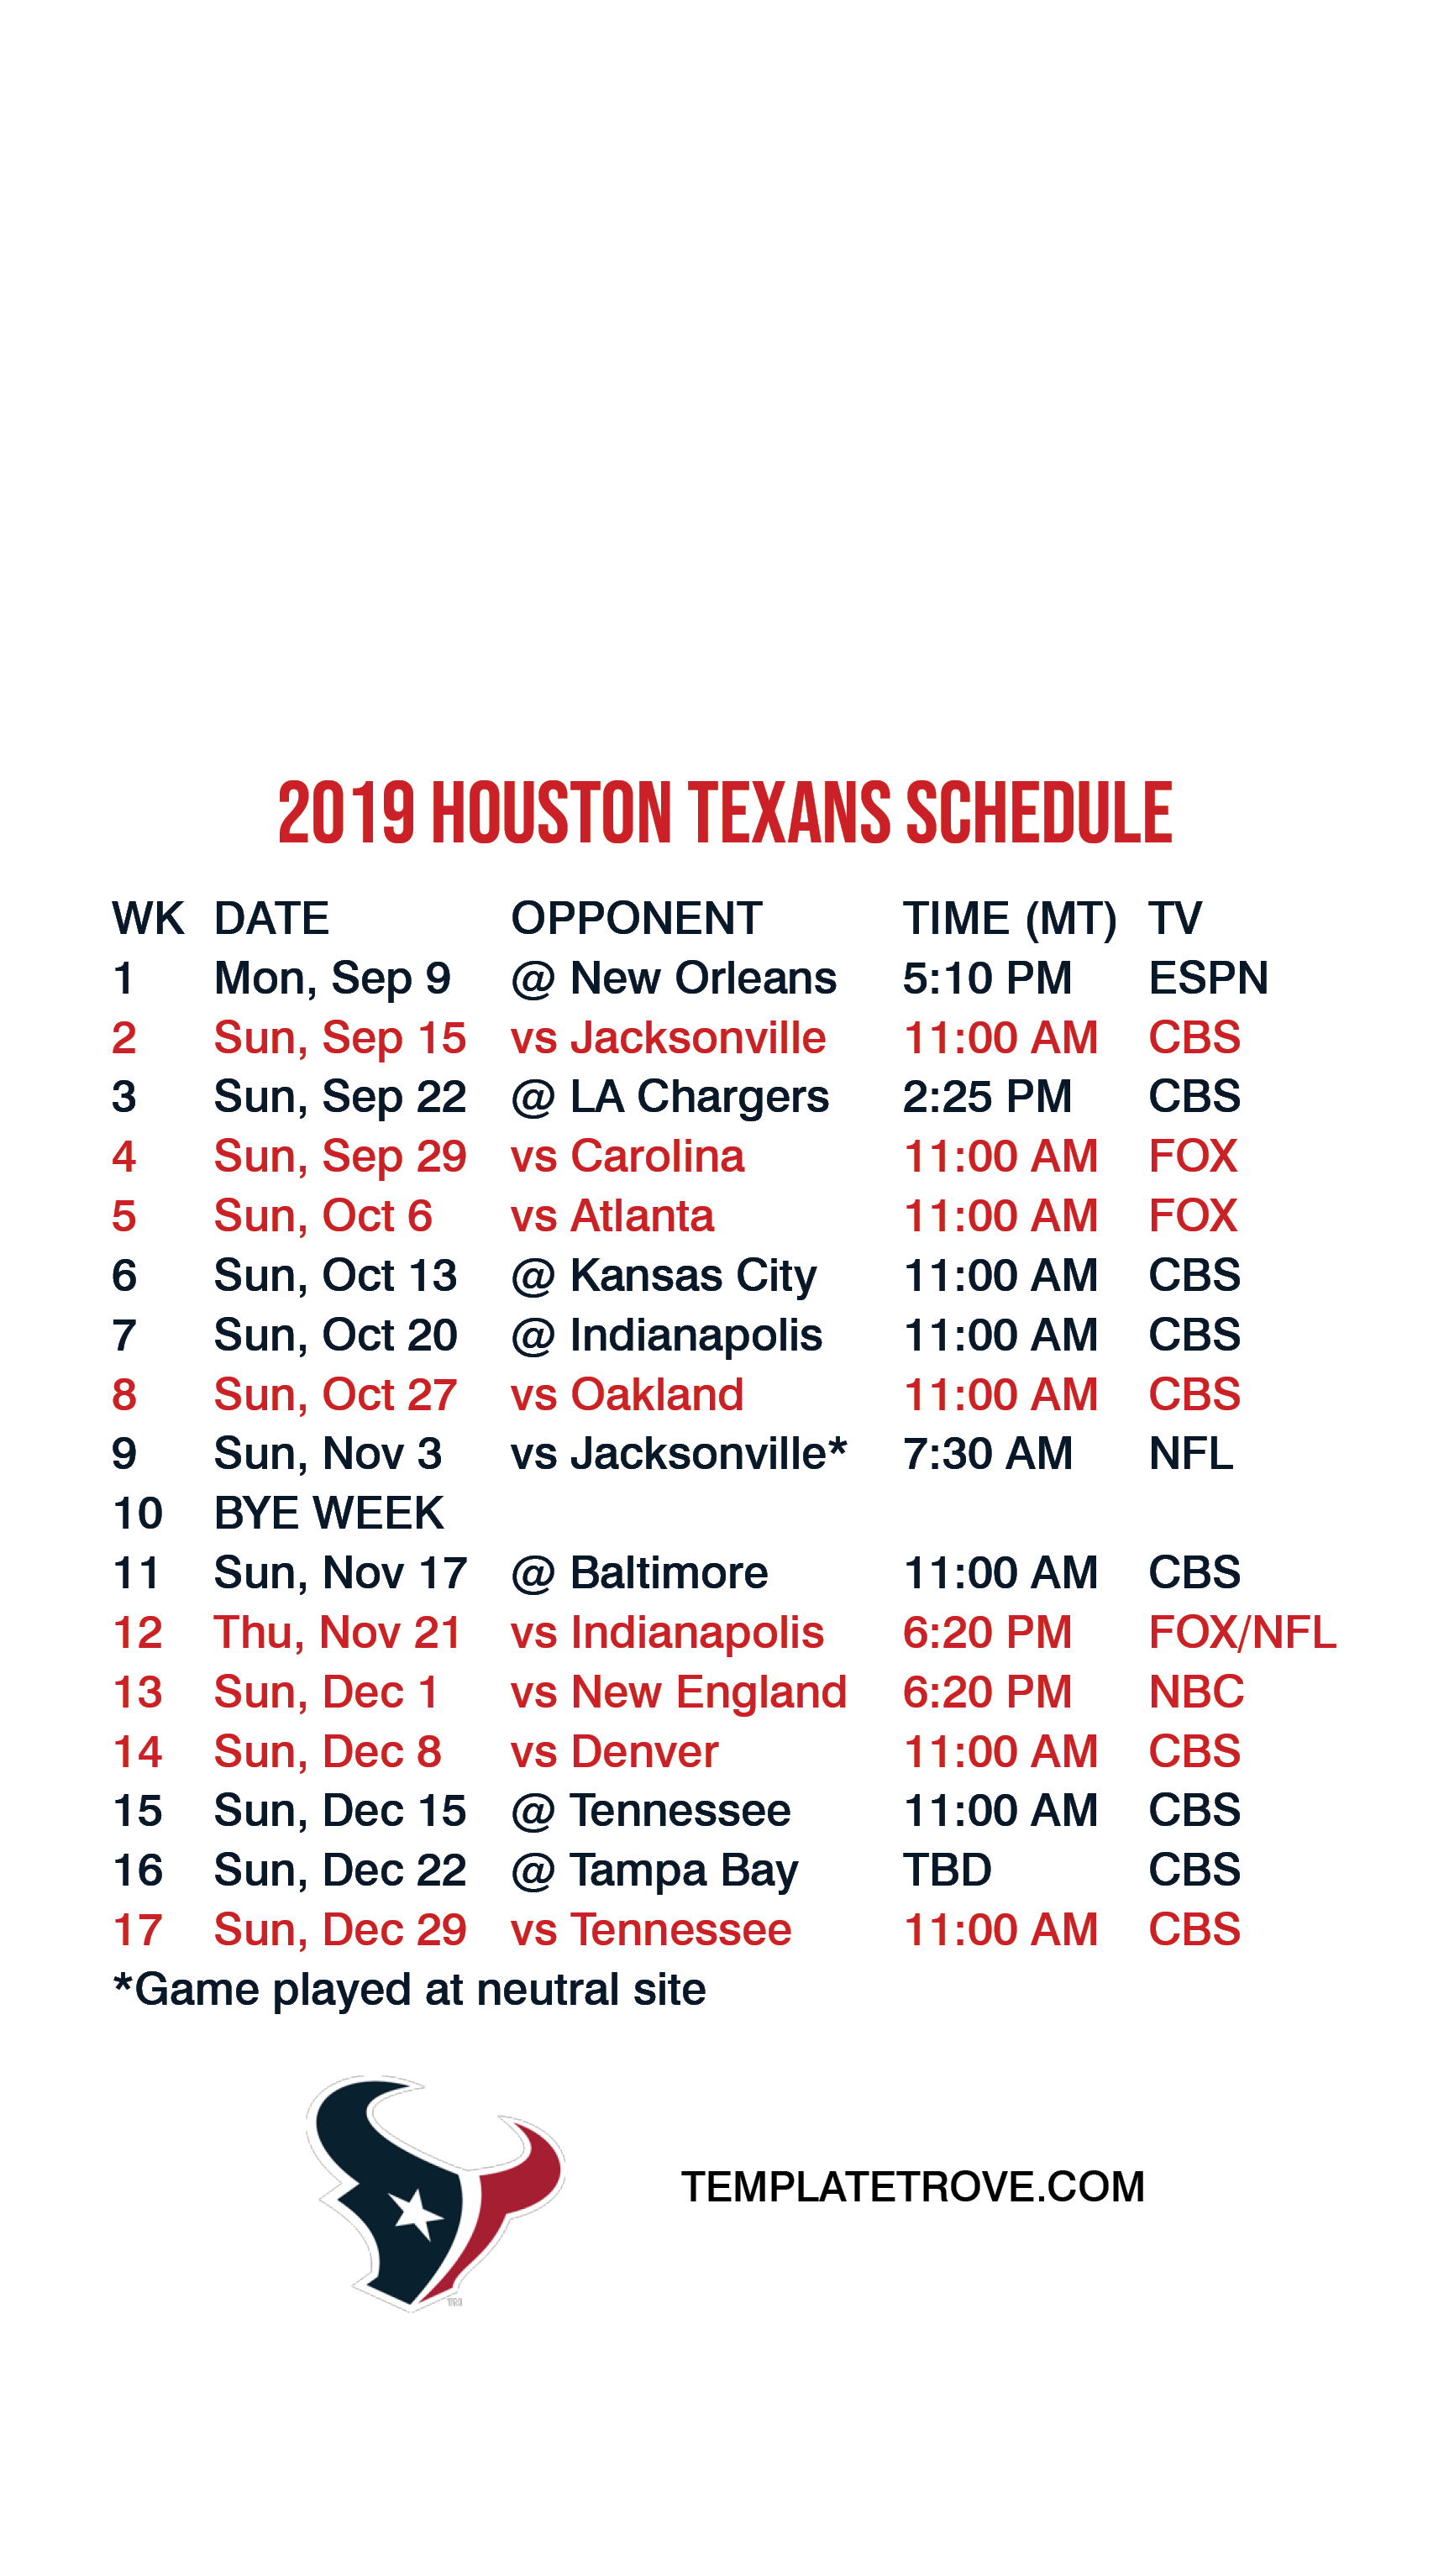 2019 2020 Houston Texans Lock Screen Schedule For Iphone 6 7 8 Plus